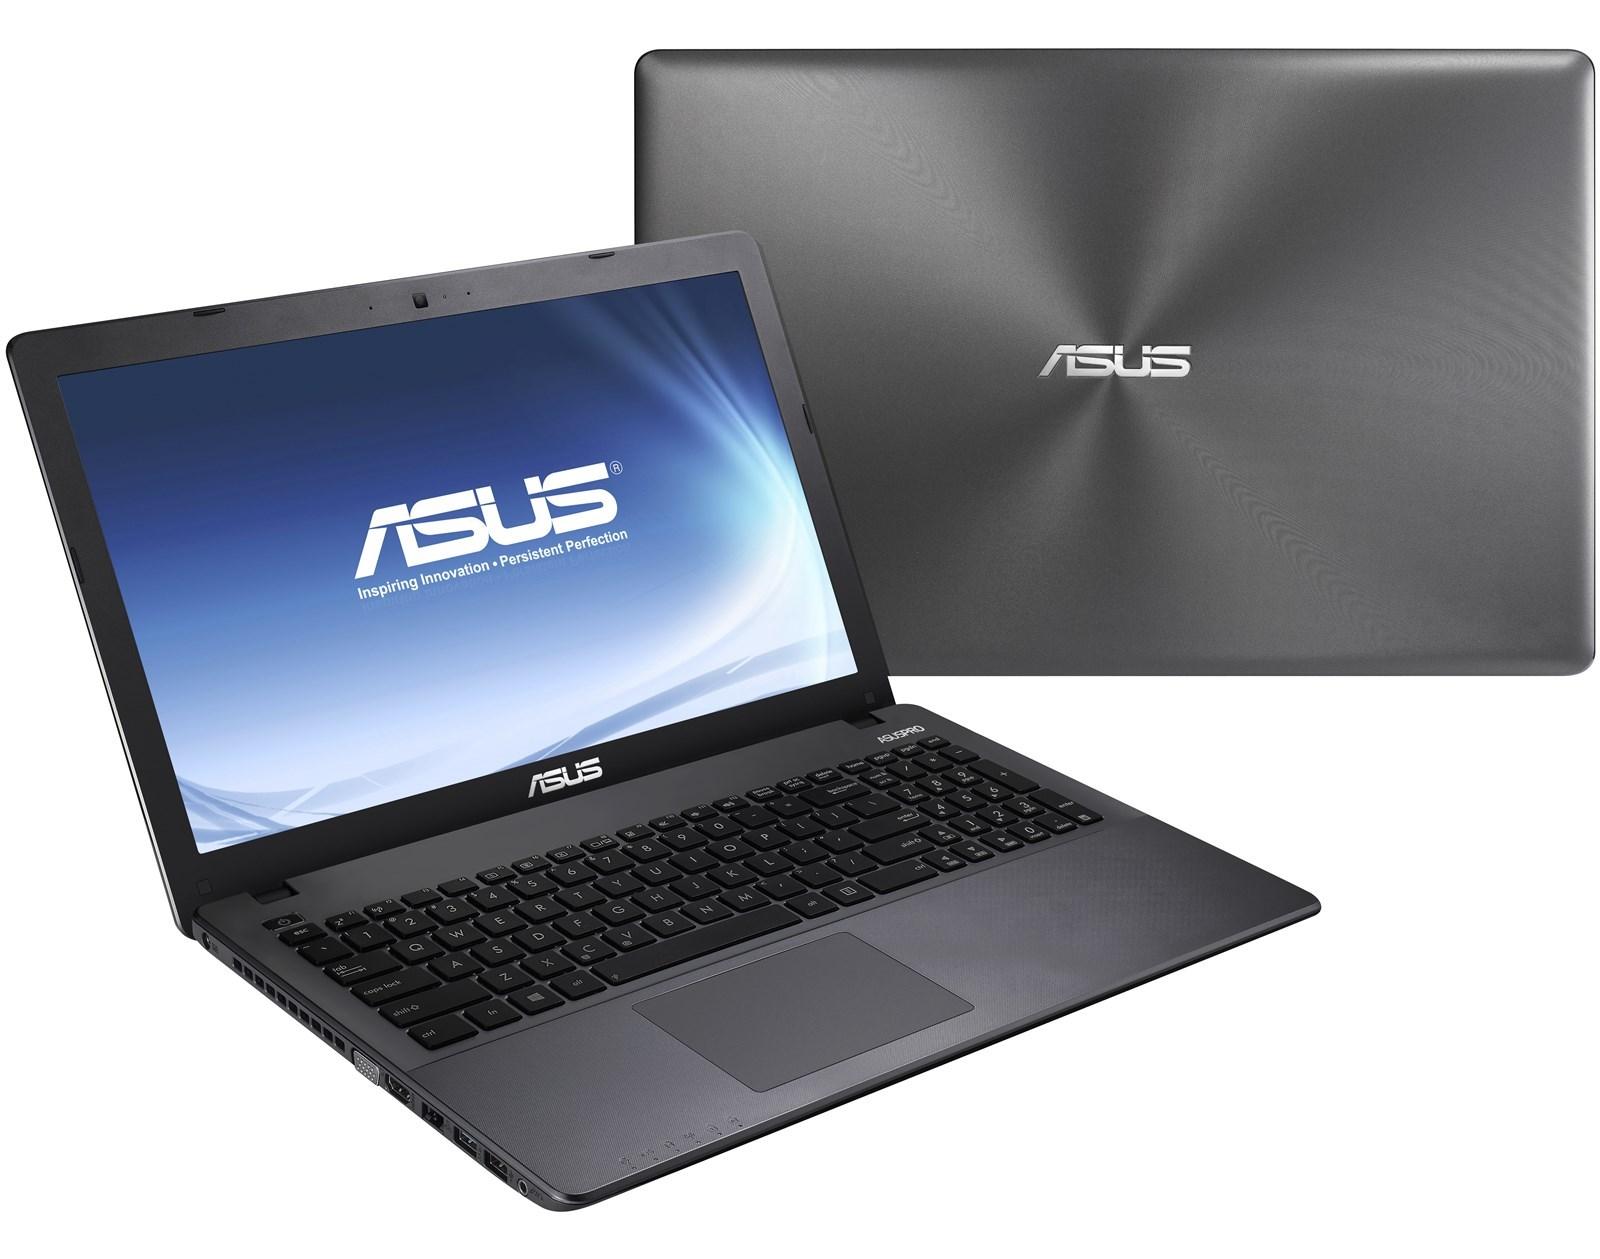 Laptop Asus P450LAV-WO131D core i3 4010U 4GB/500GB/14